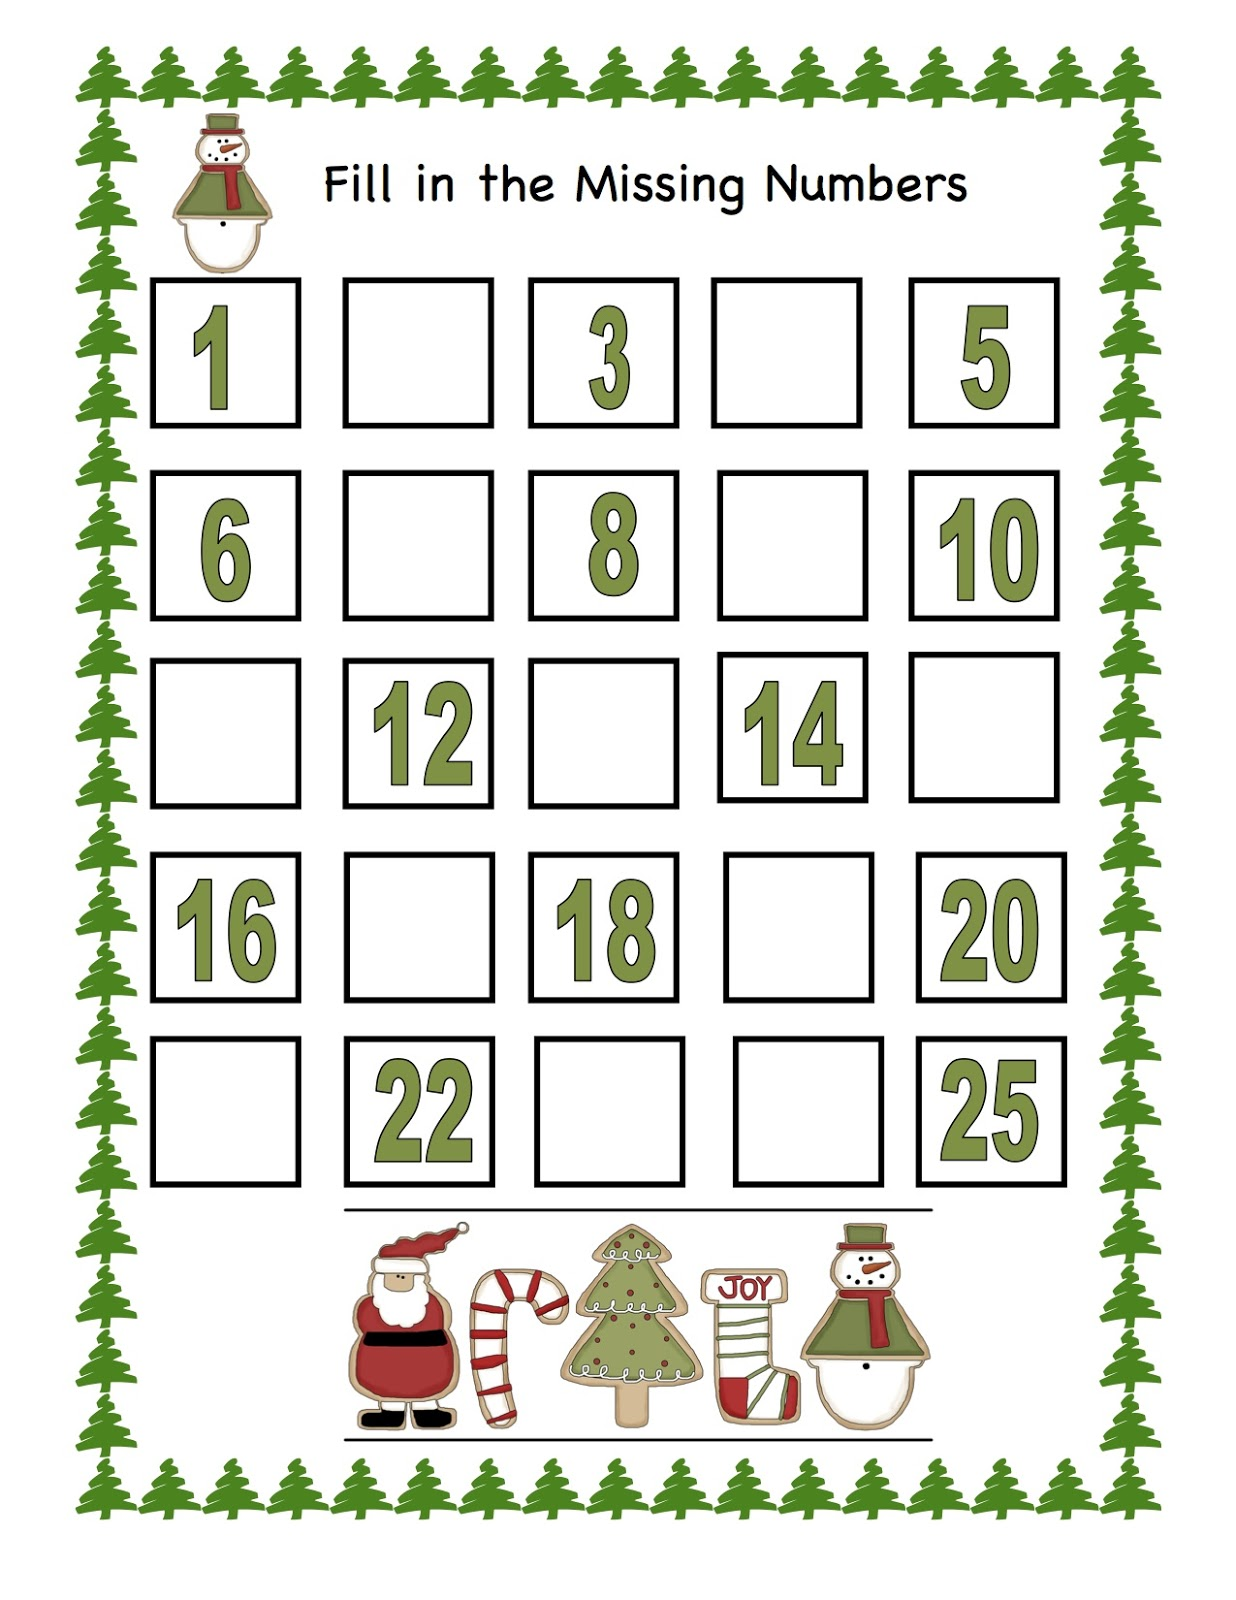 Worksheet Fill In The Missing Number Worksheet Worksheet